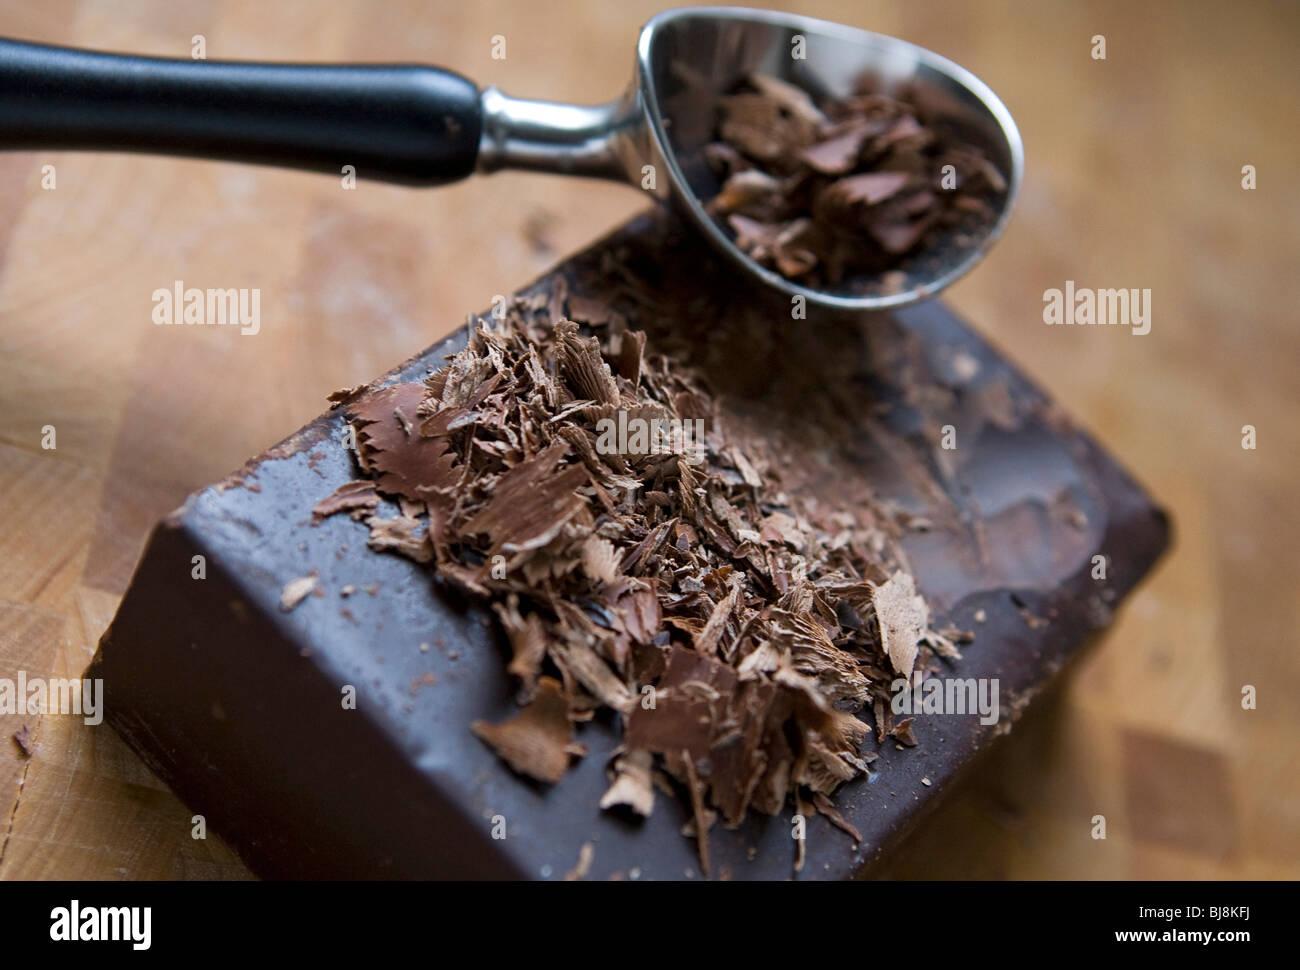 A block of dark chocolate and dark chocolate shavings.  - Stock Image